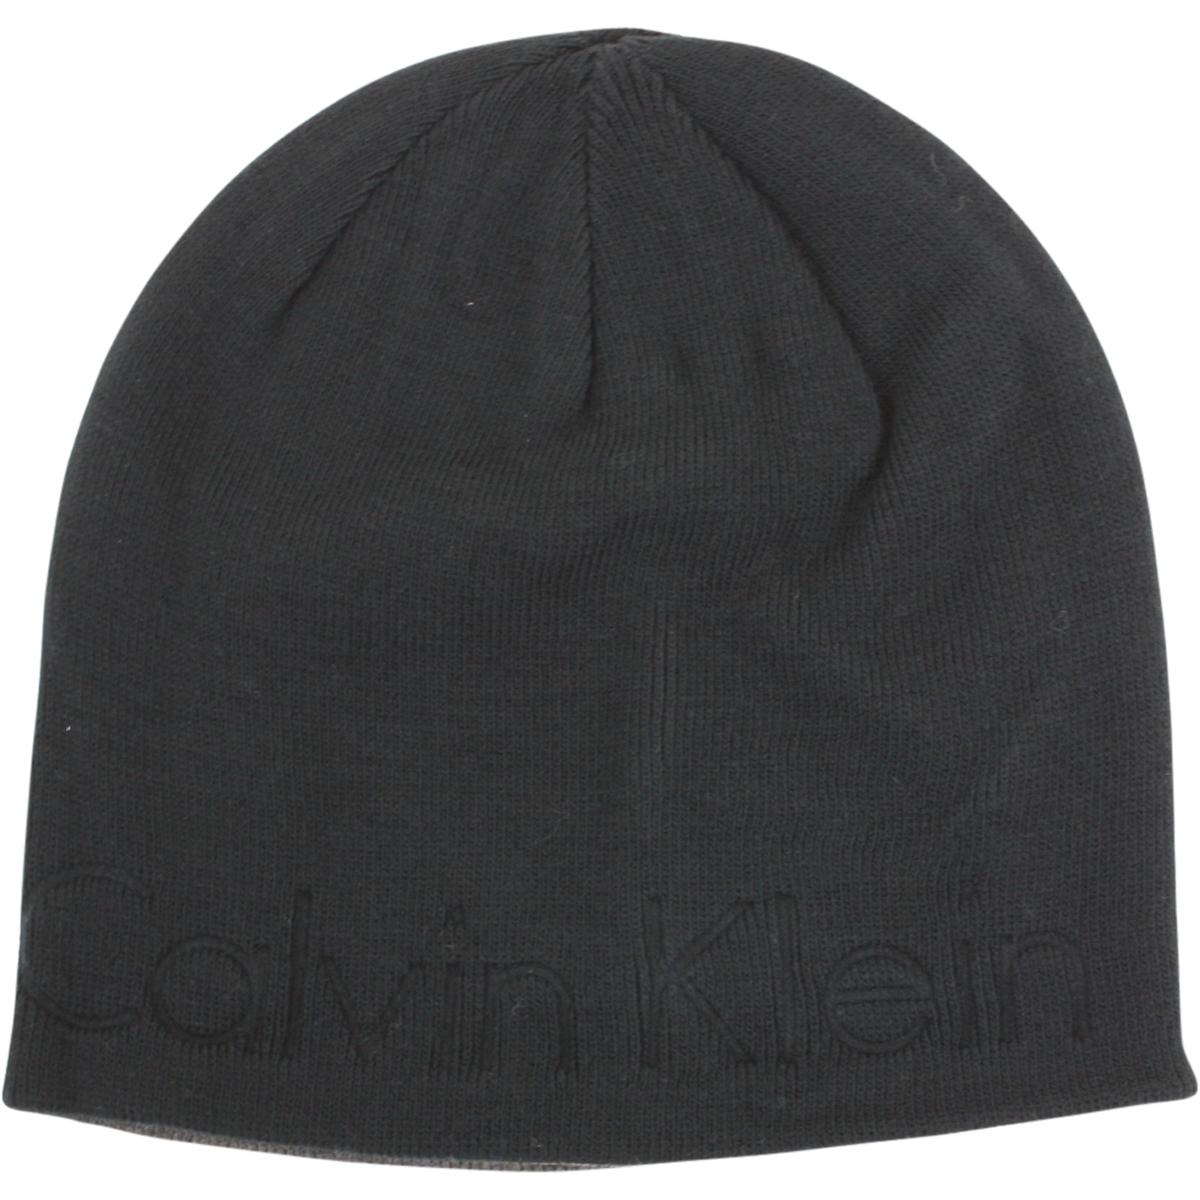 86f00b5b608 Calvin Klein Men s Embossed Logo Beanie Cap Winter Hat (One Size ...